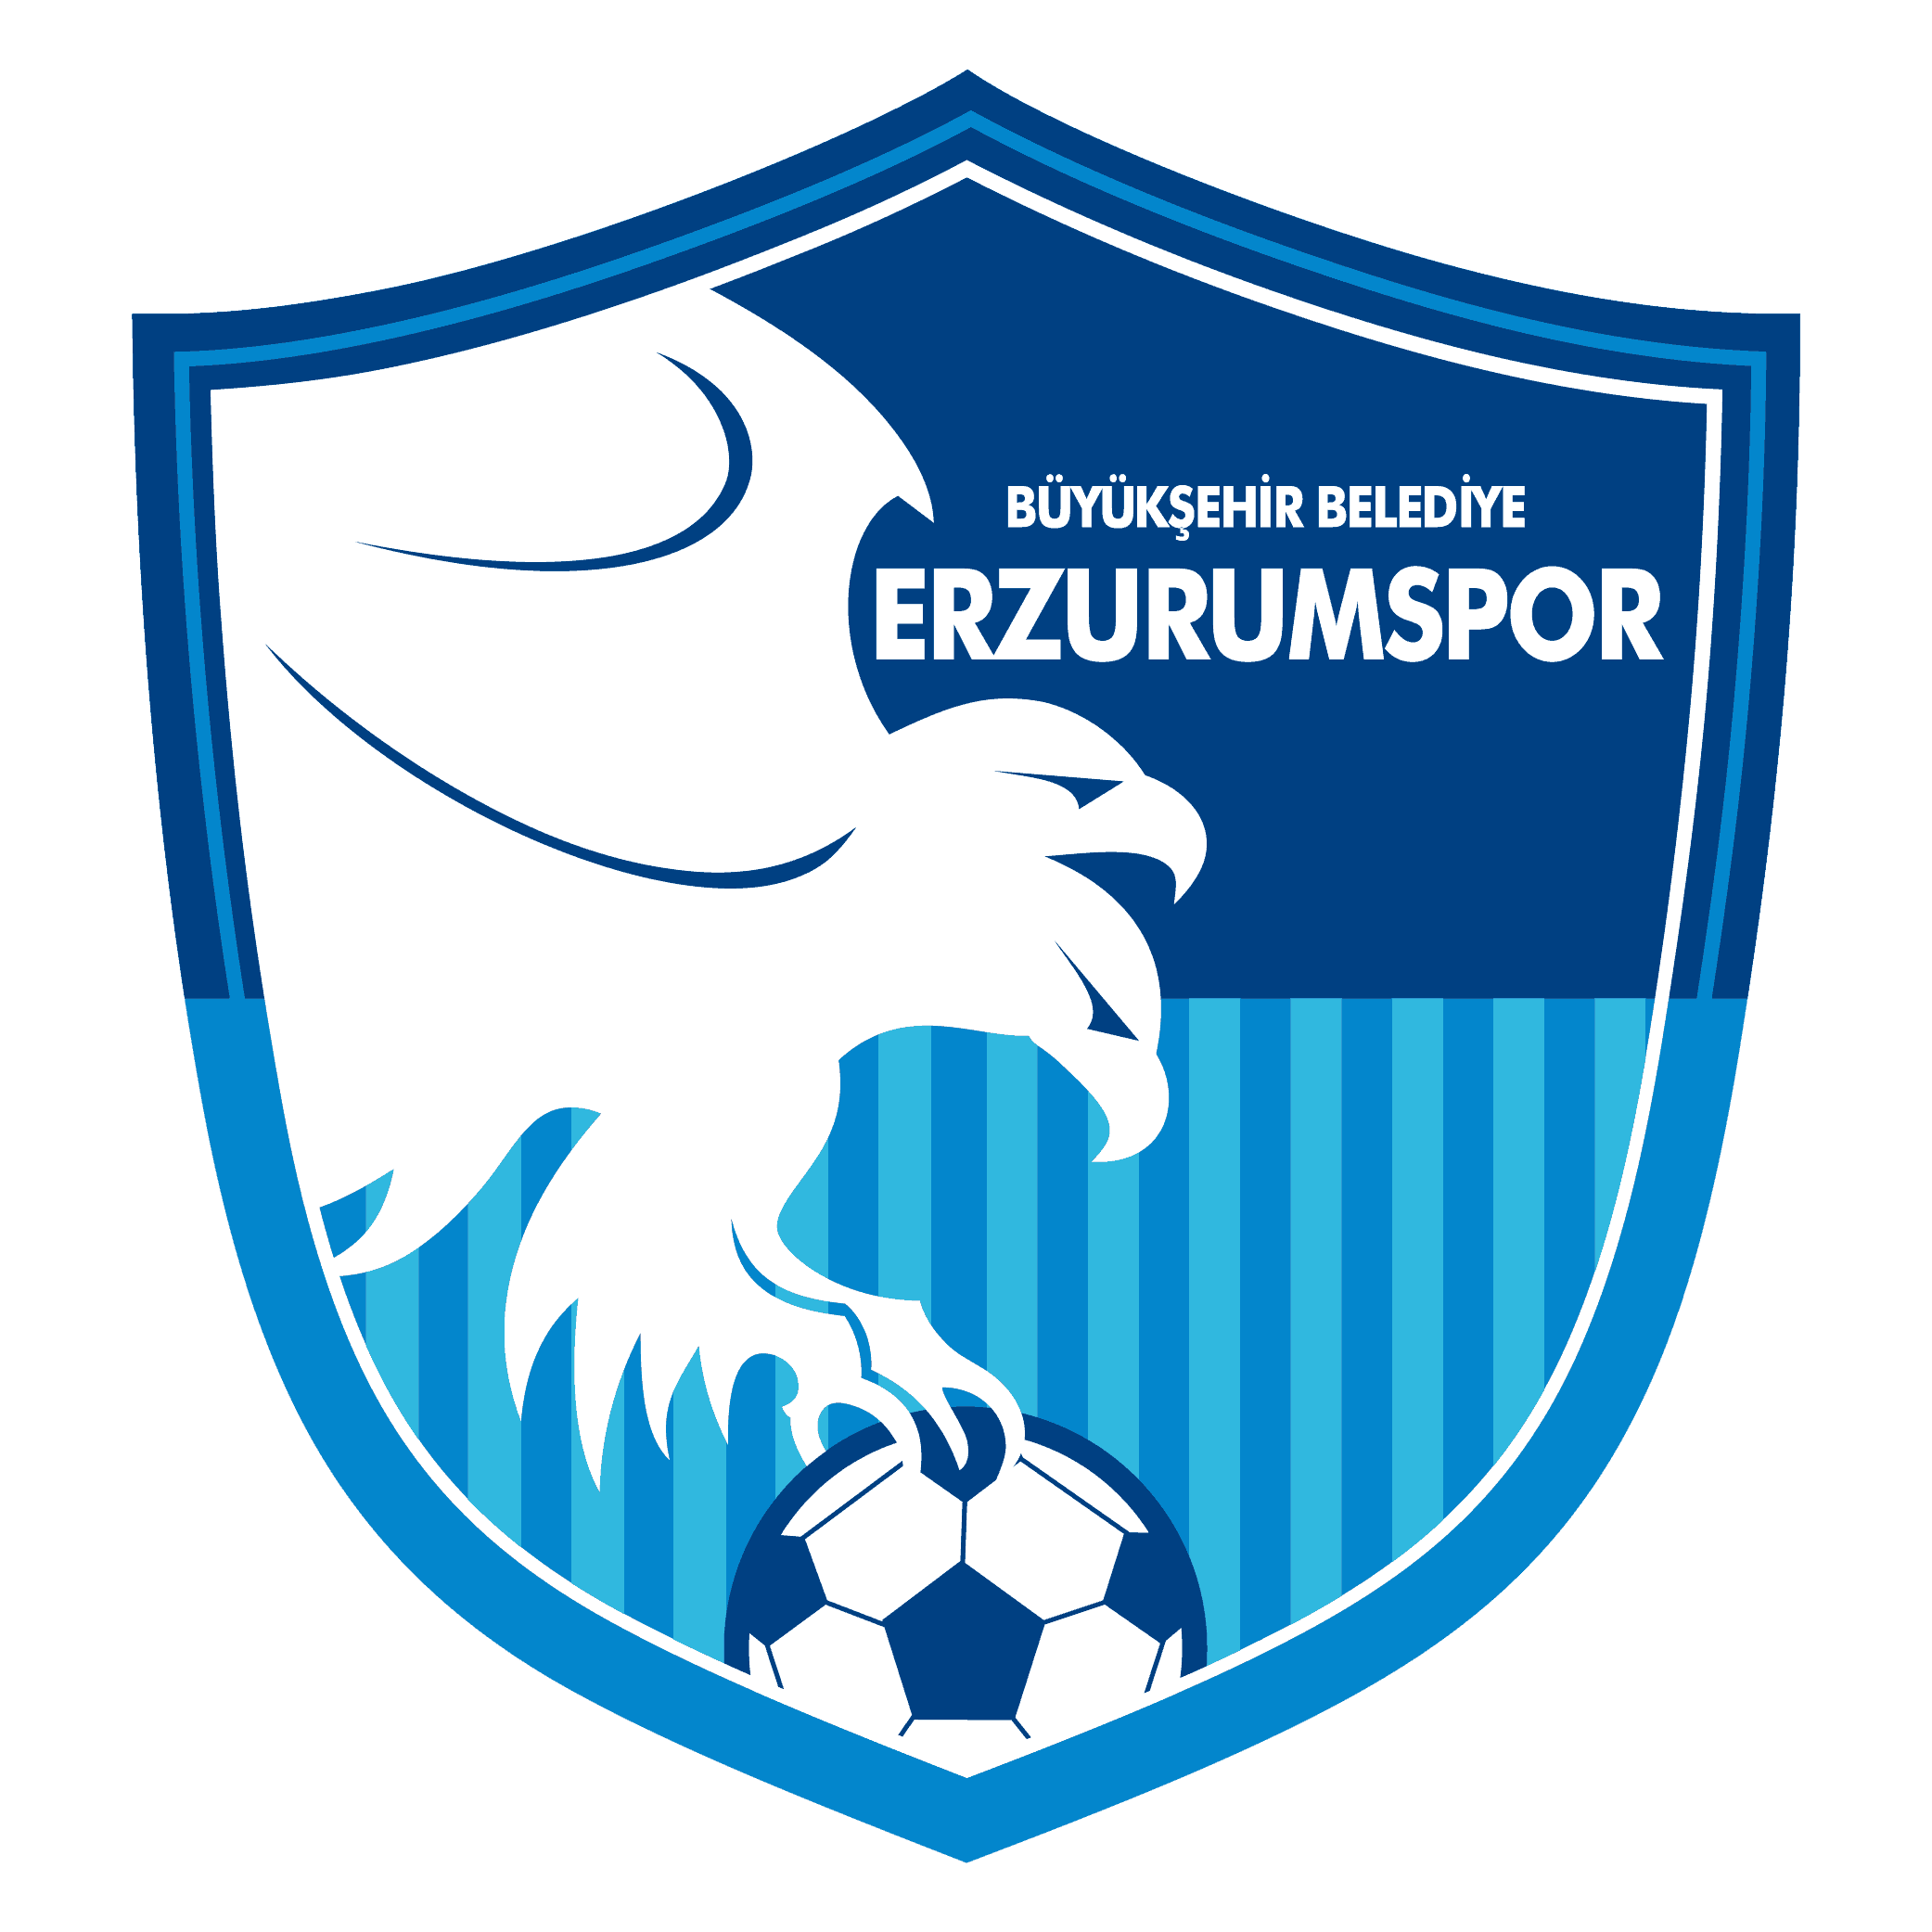 BB Erzurumspor Logo png